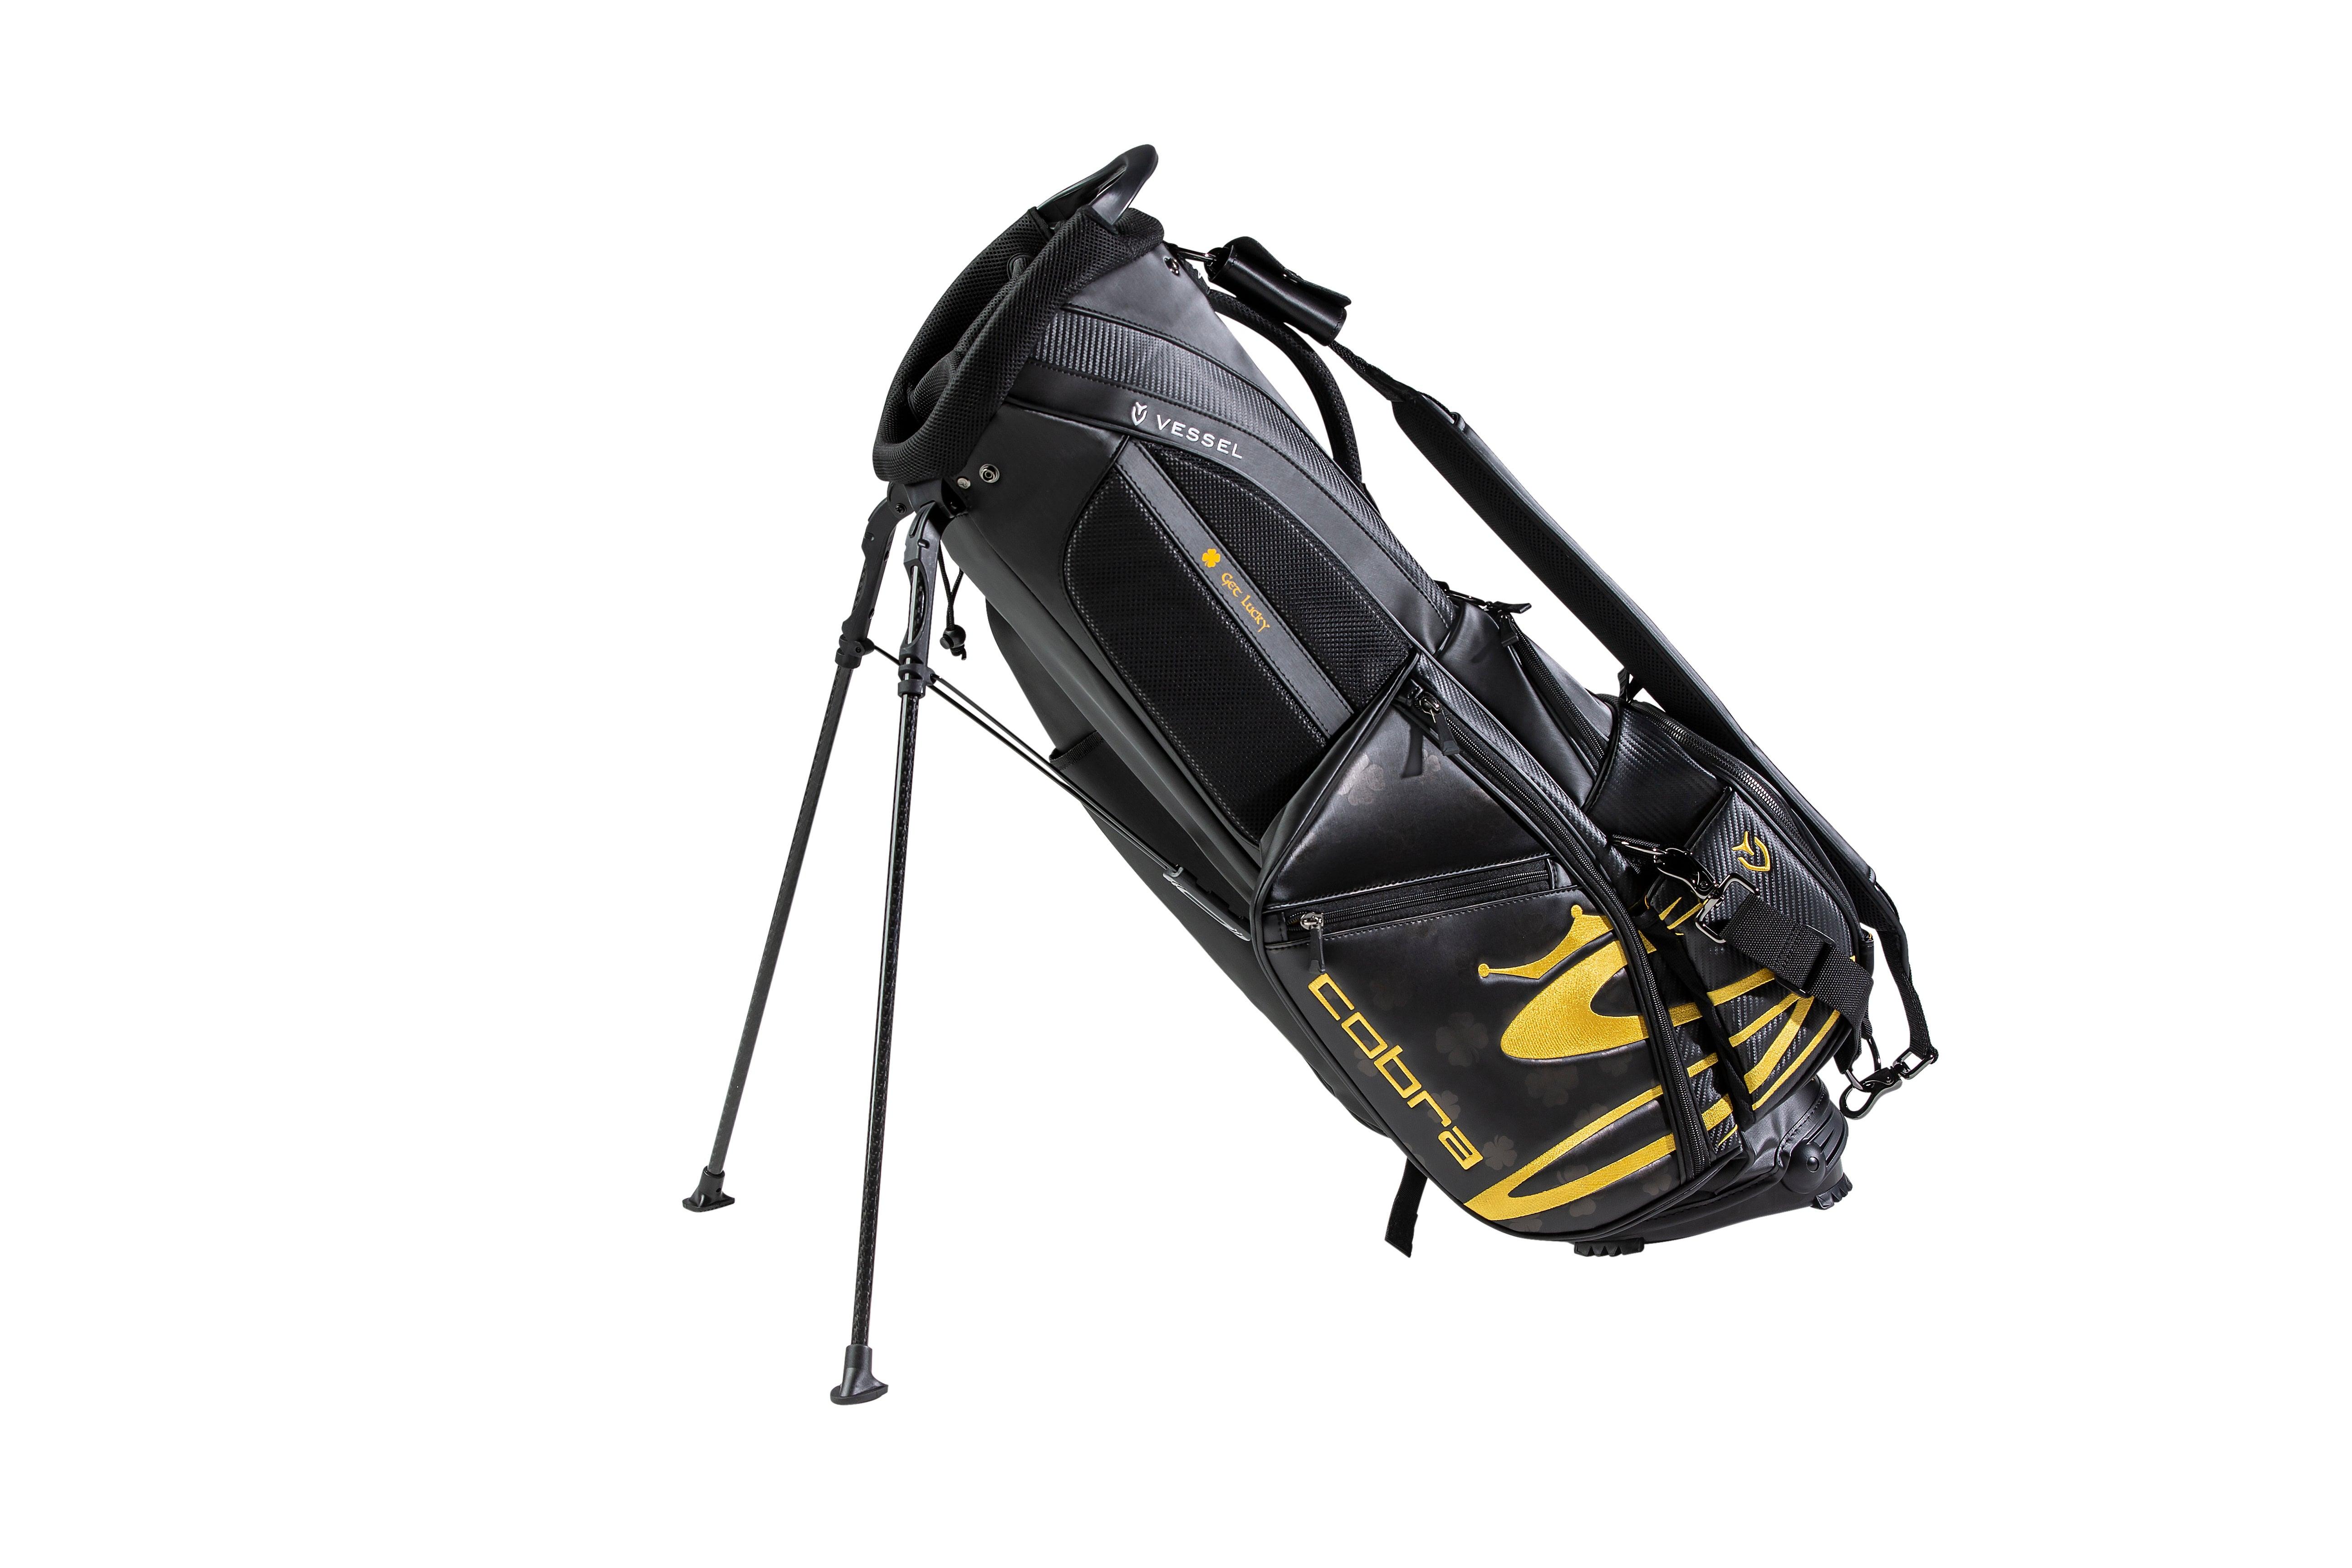 Bryson DeChambeau's custom Cobra St. Patrick's Day golf bag.